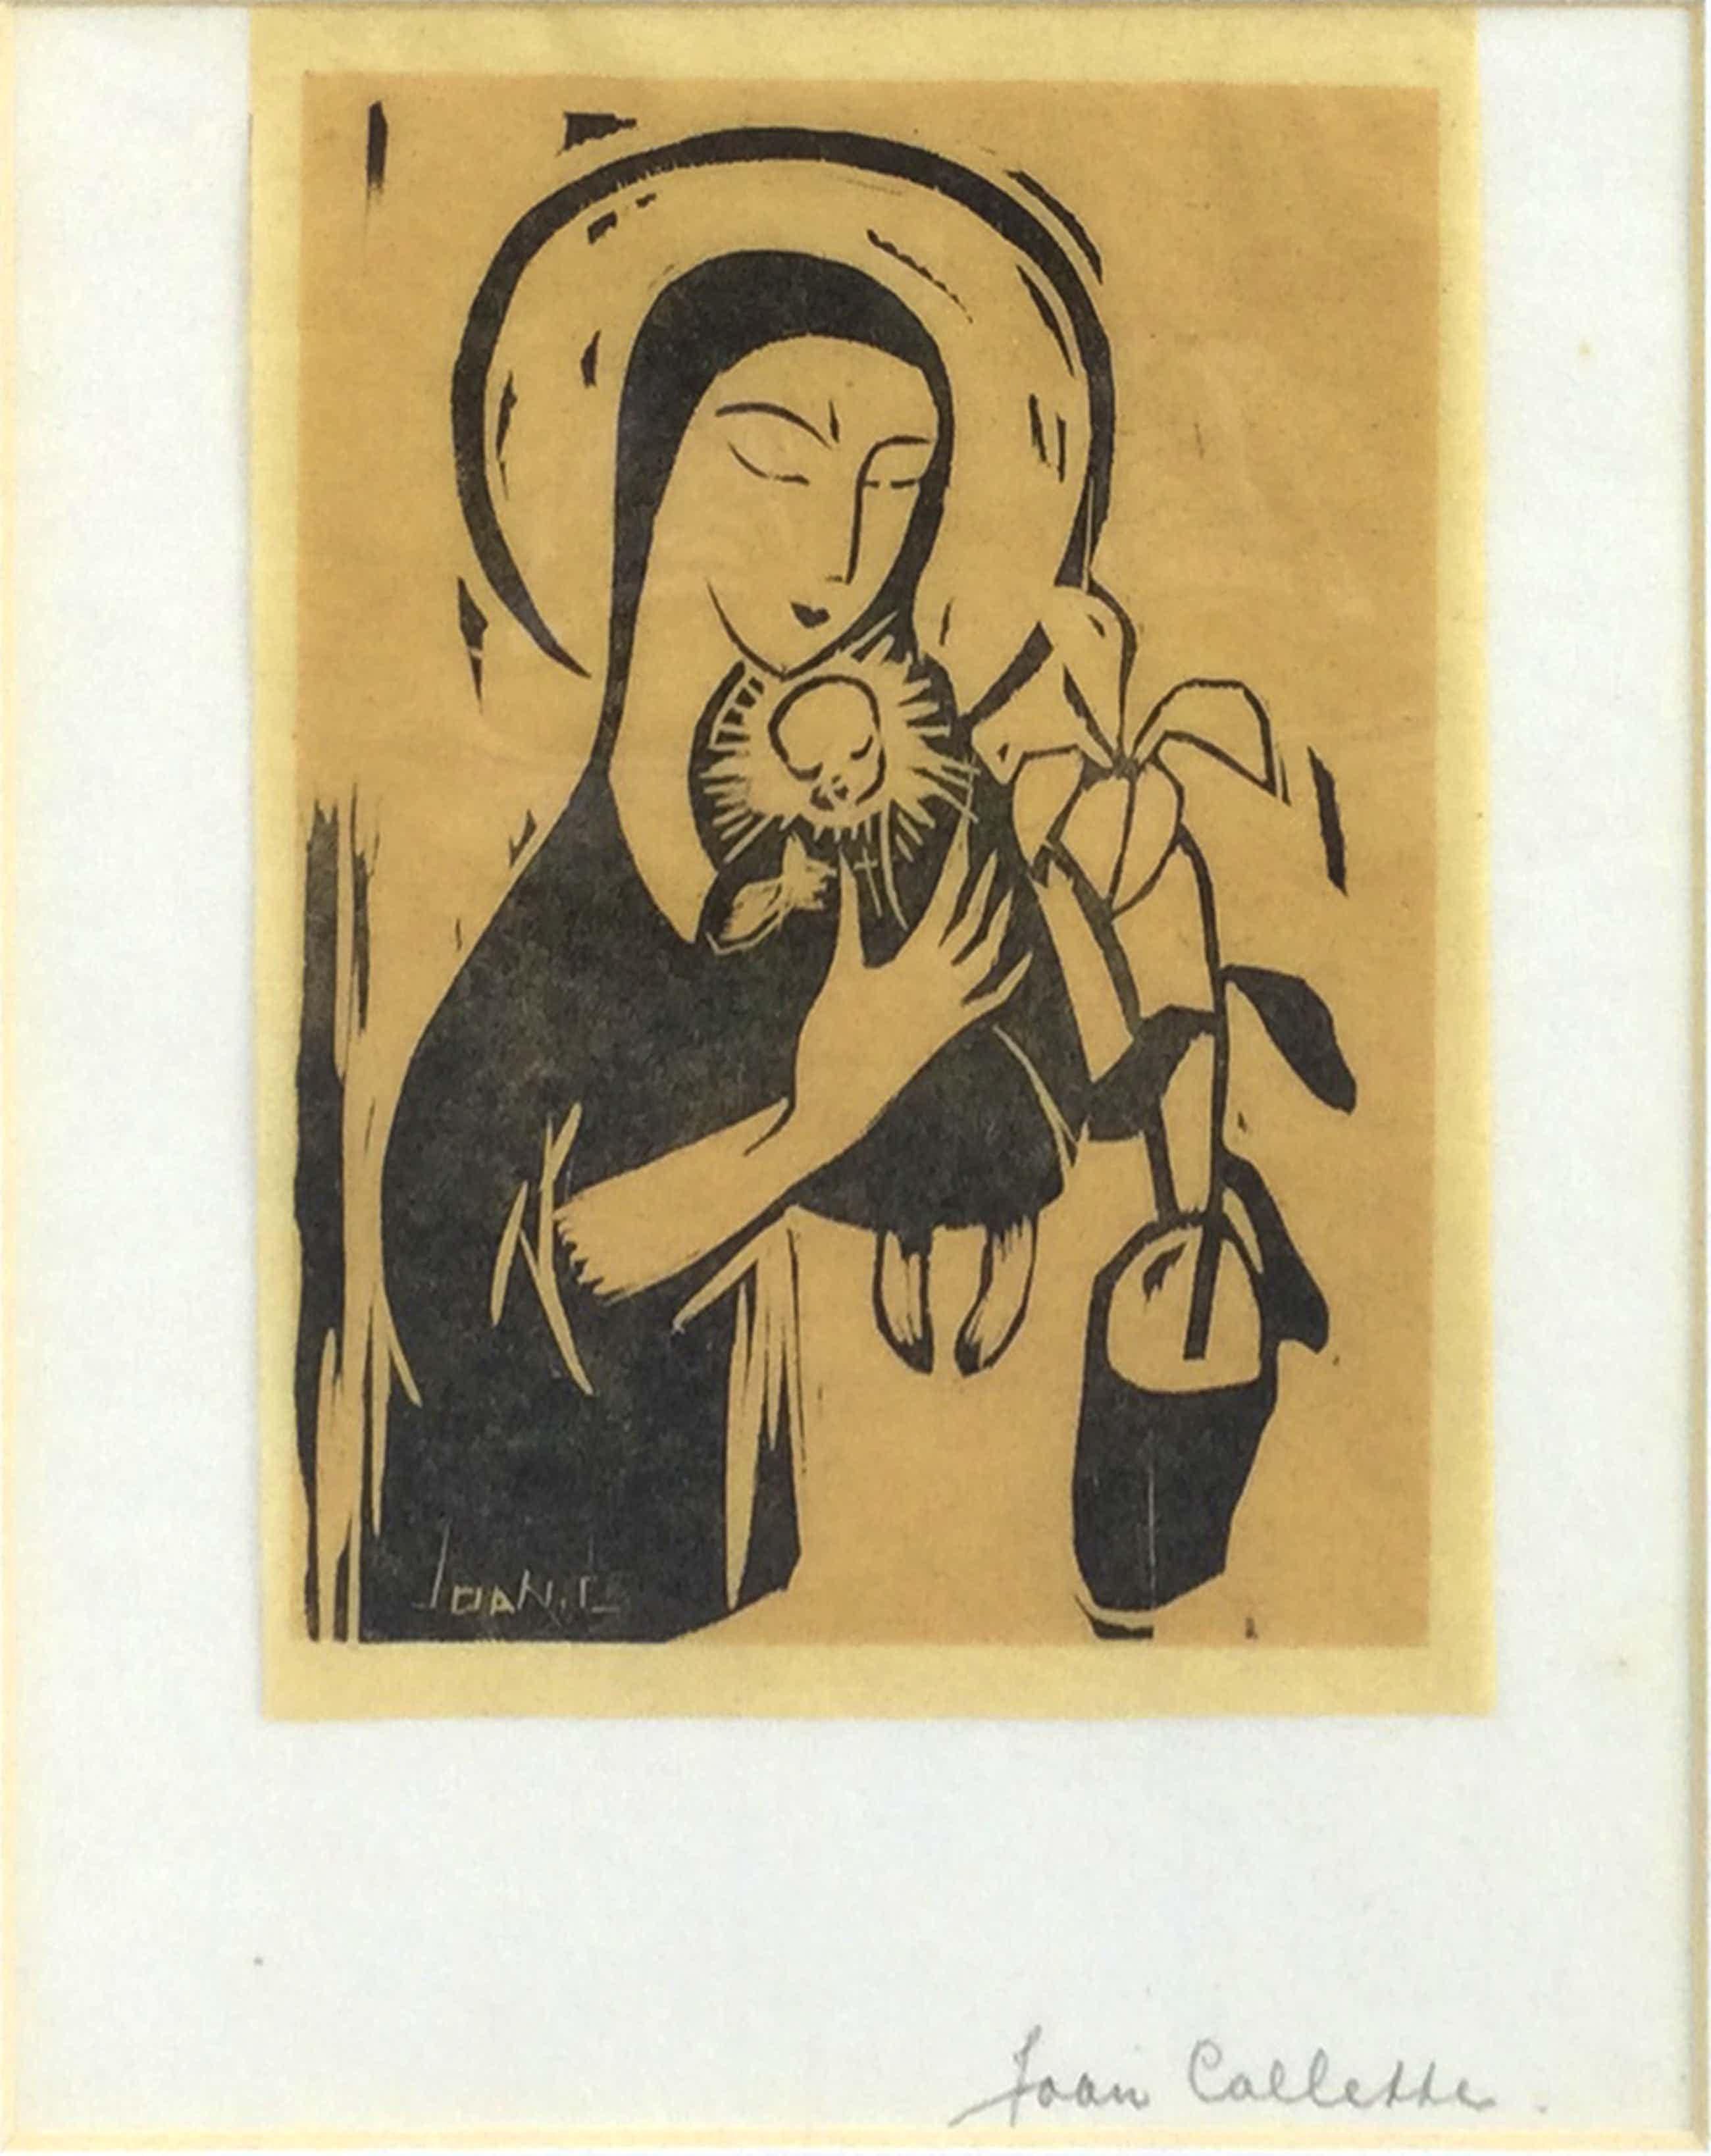 Joan Collette - C5091-6, Madonna met kind kopen? Bied vanaf 45!